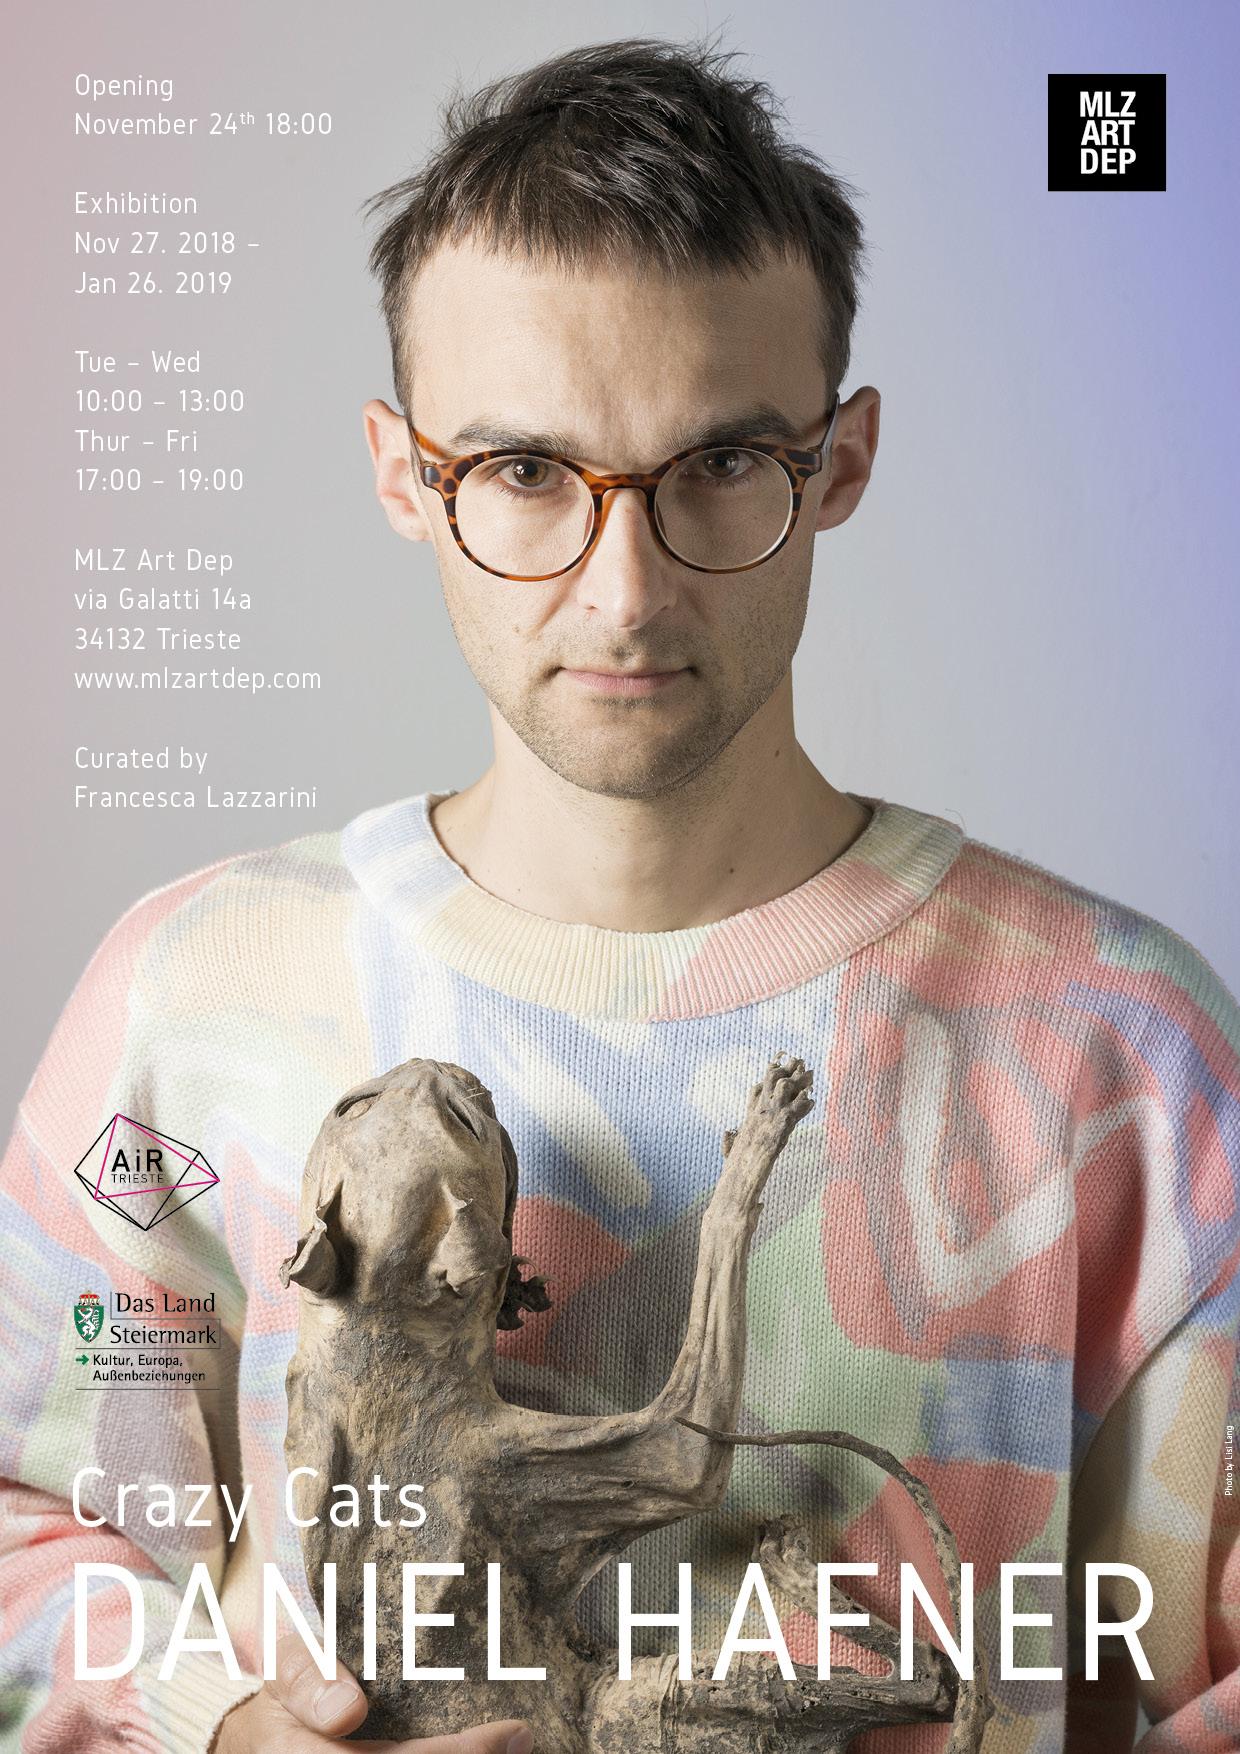 Daniel Hafner - Crazy Cat (poster)